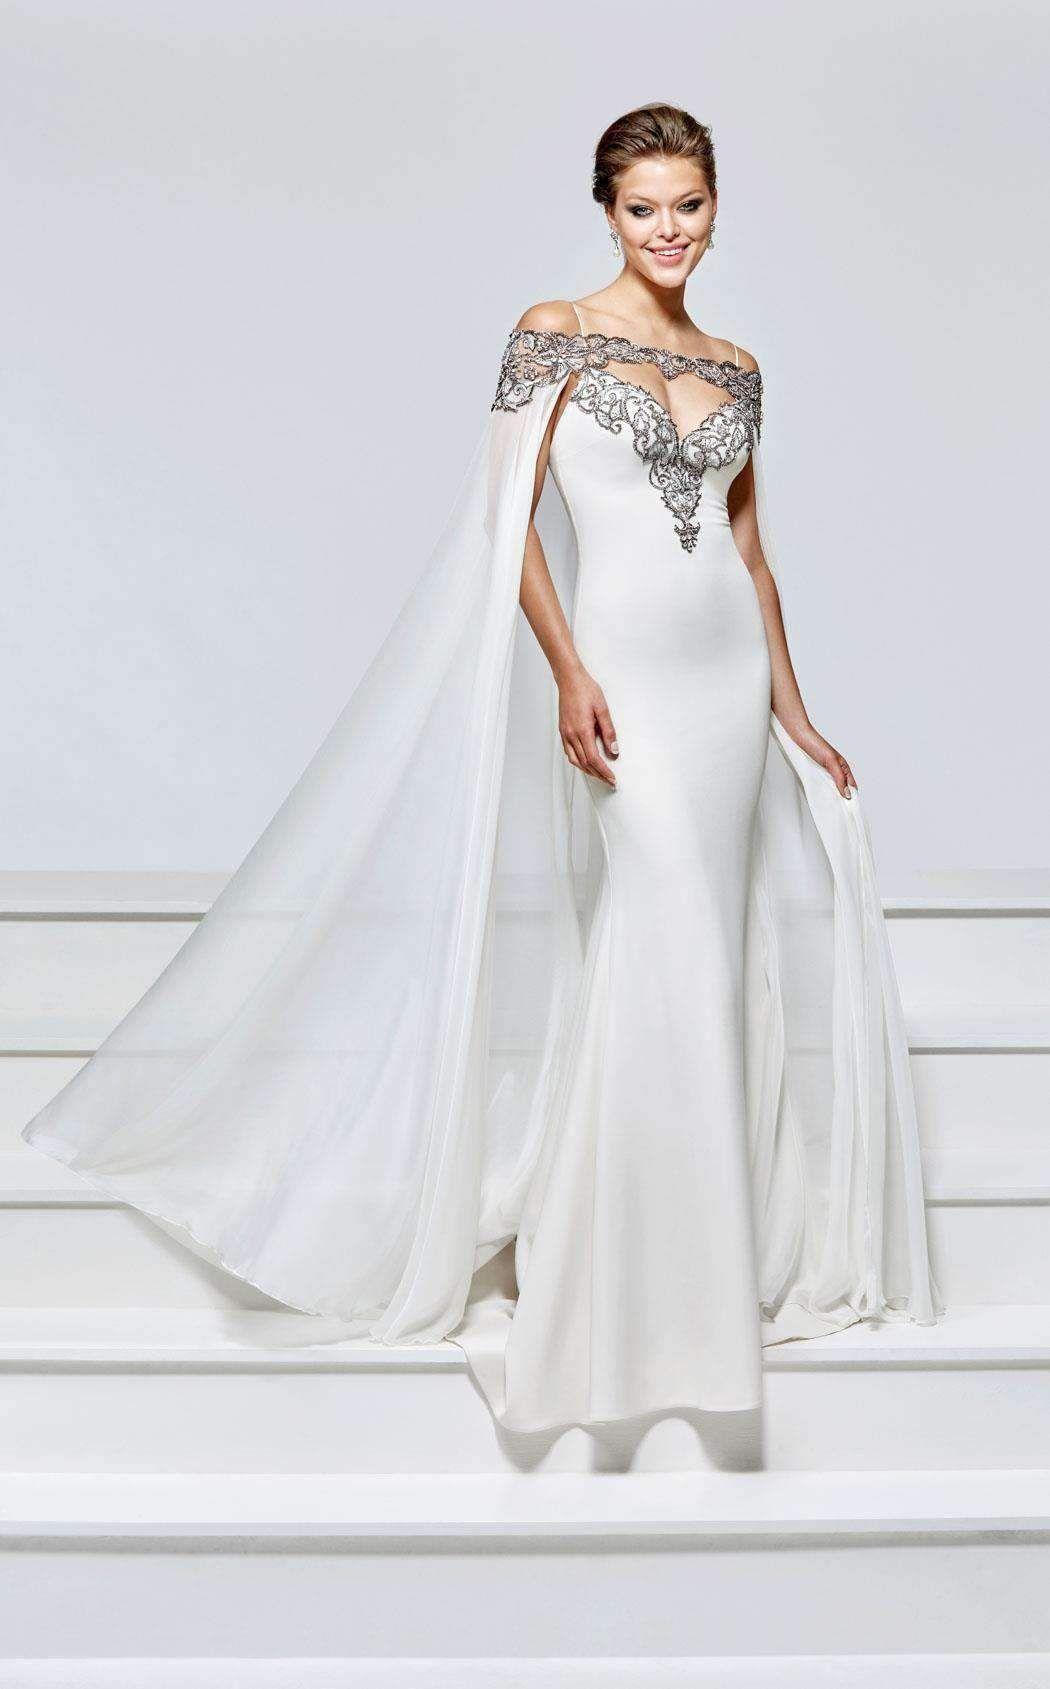 Tarik ediz in products pinterest vestido de noiva